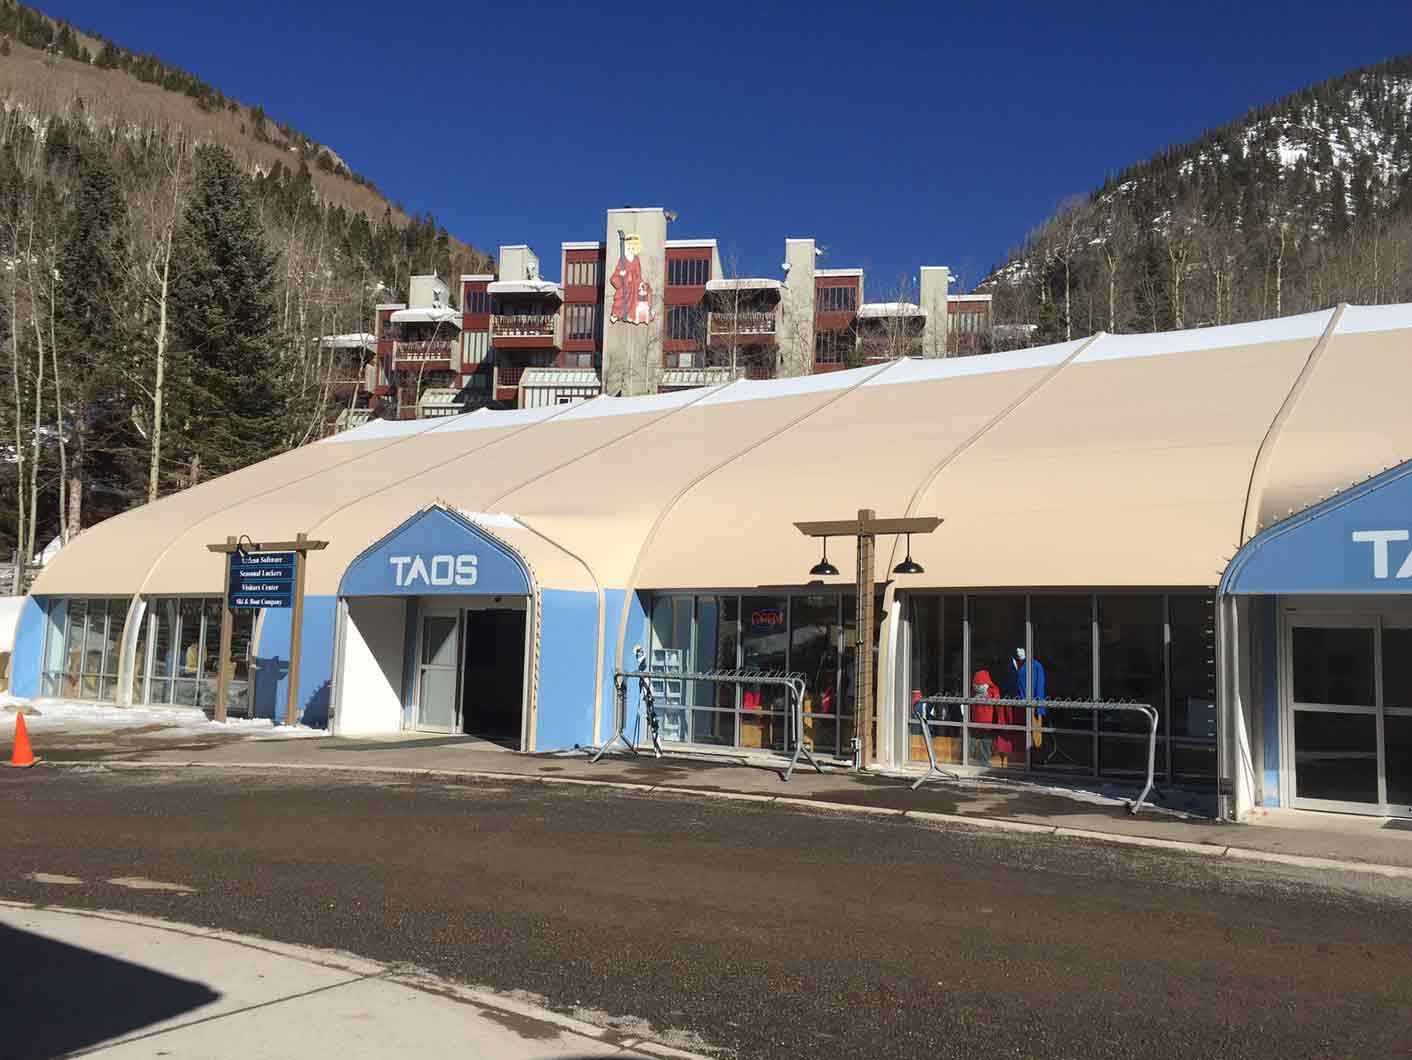 Ski Taos Ski Resort fabric structure welcome center